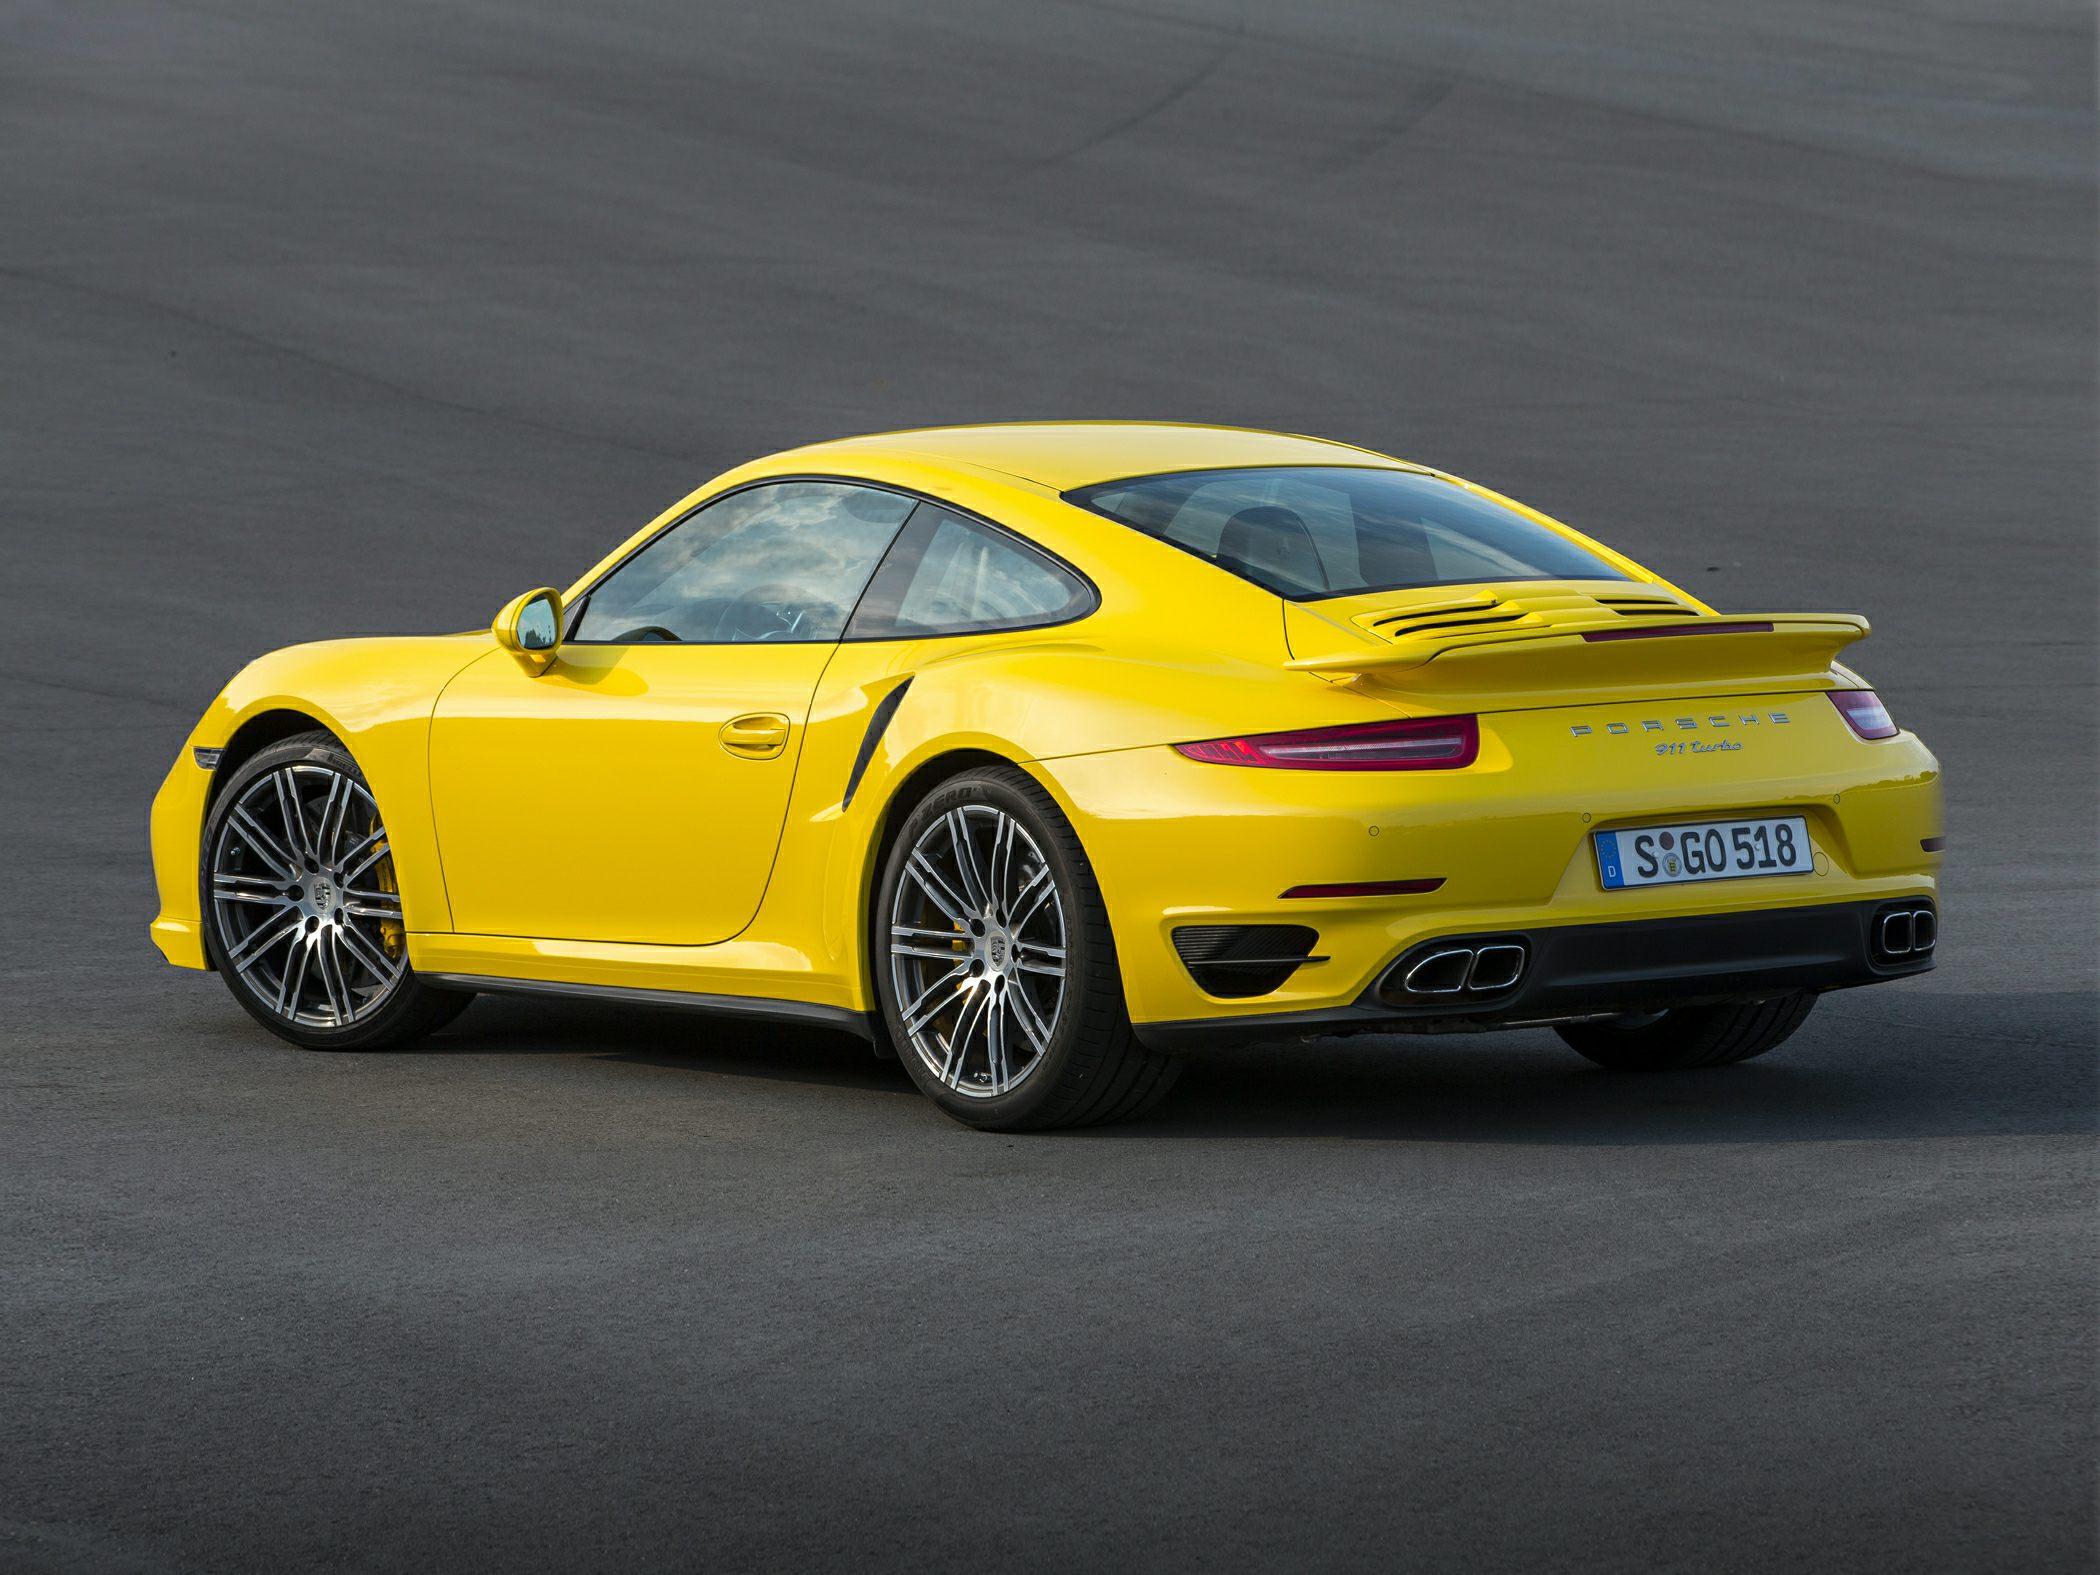 2015 Porsche 911 Side Rear